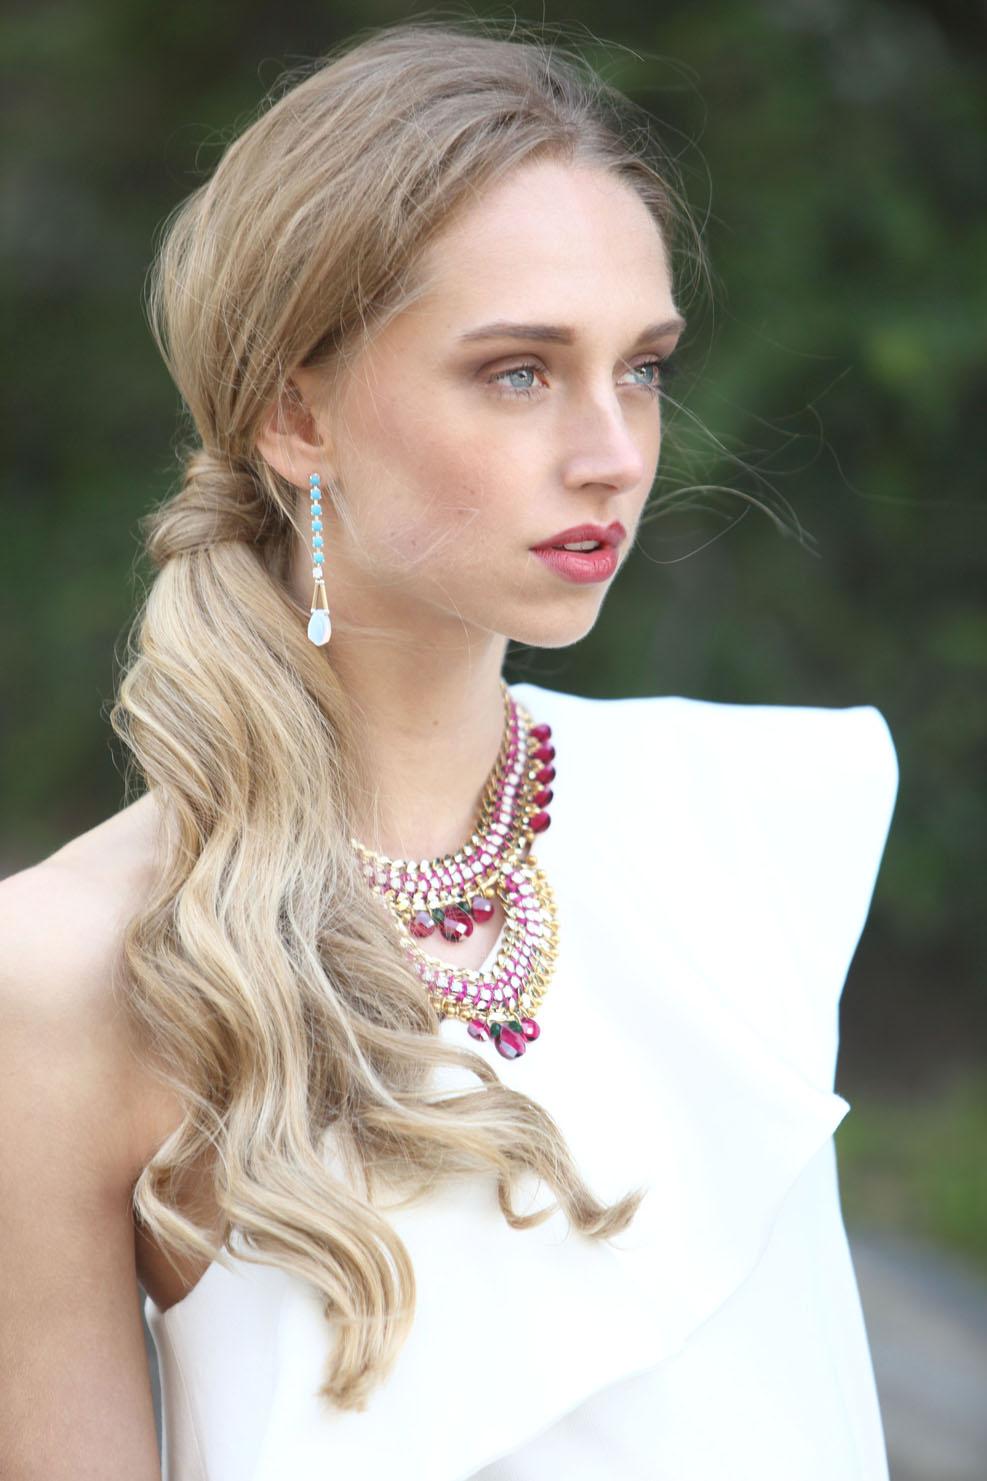 Diversión y halagos peinados modernos Colección de ideas de color de pelo - Moda Cabellos: Modernos Peinados de lado para fiestas - 2015